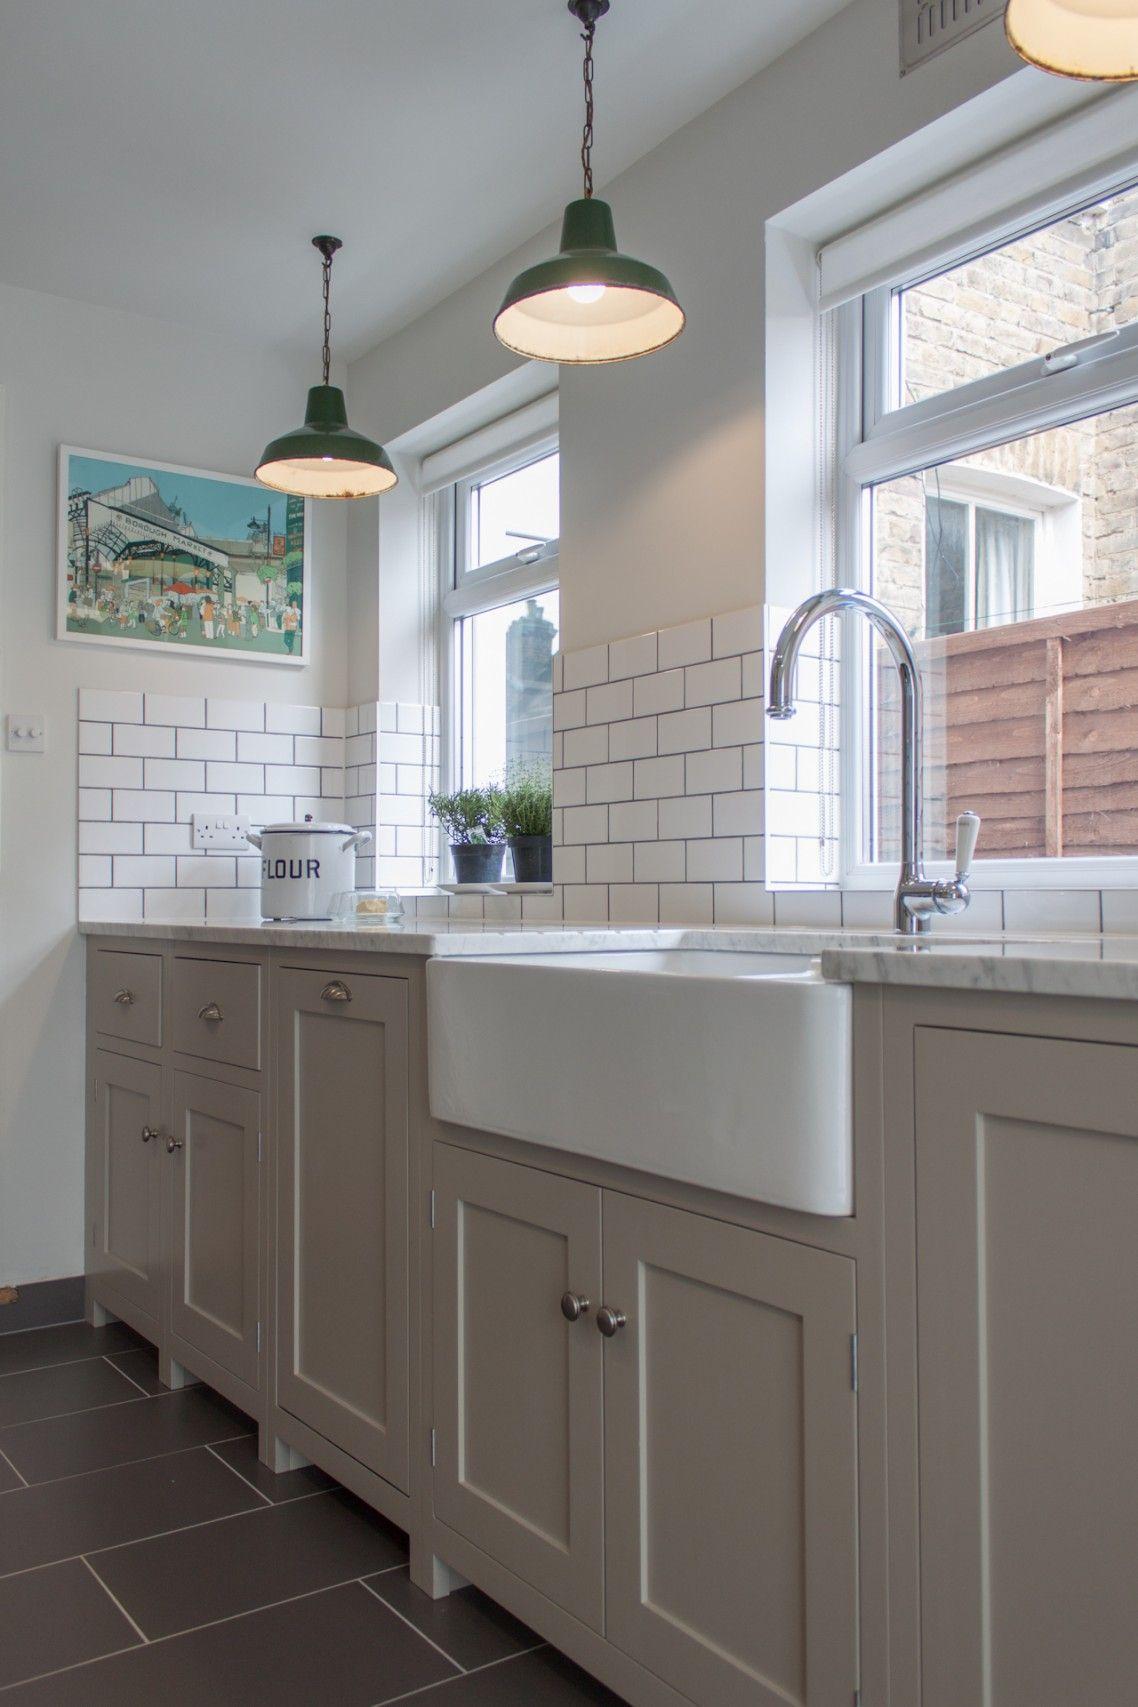 Wondrous white ceramic subway backsplash also white apron for Farm style kitchen backsplash